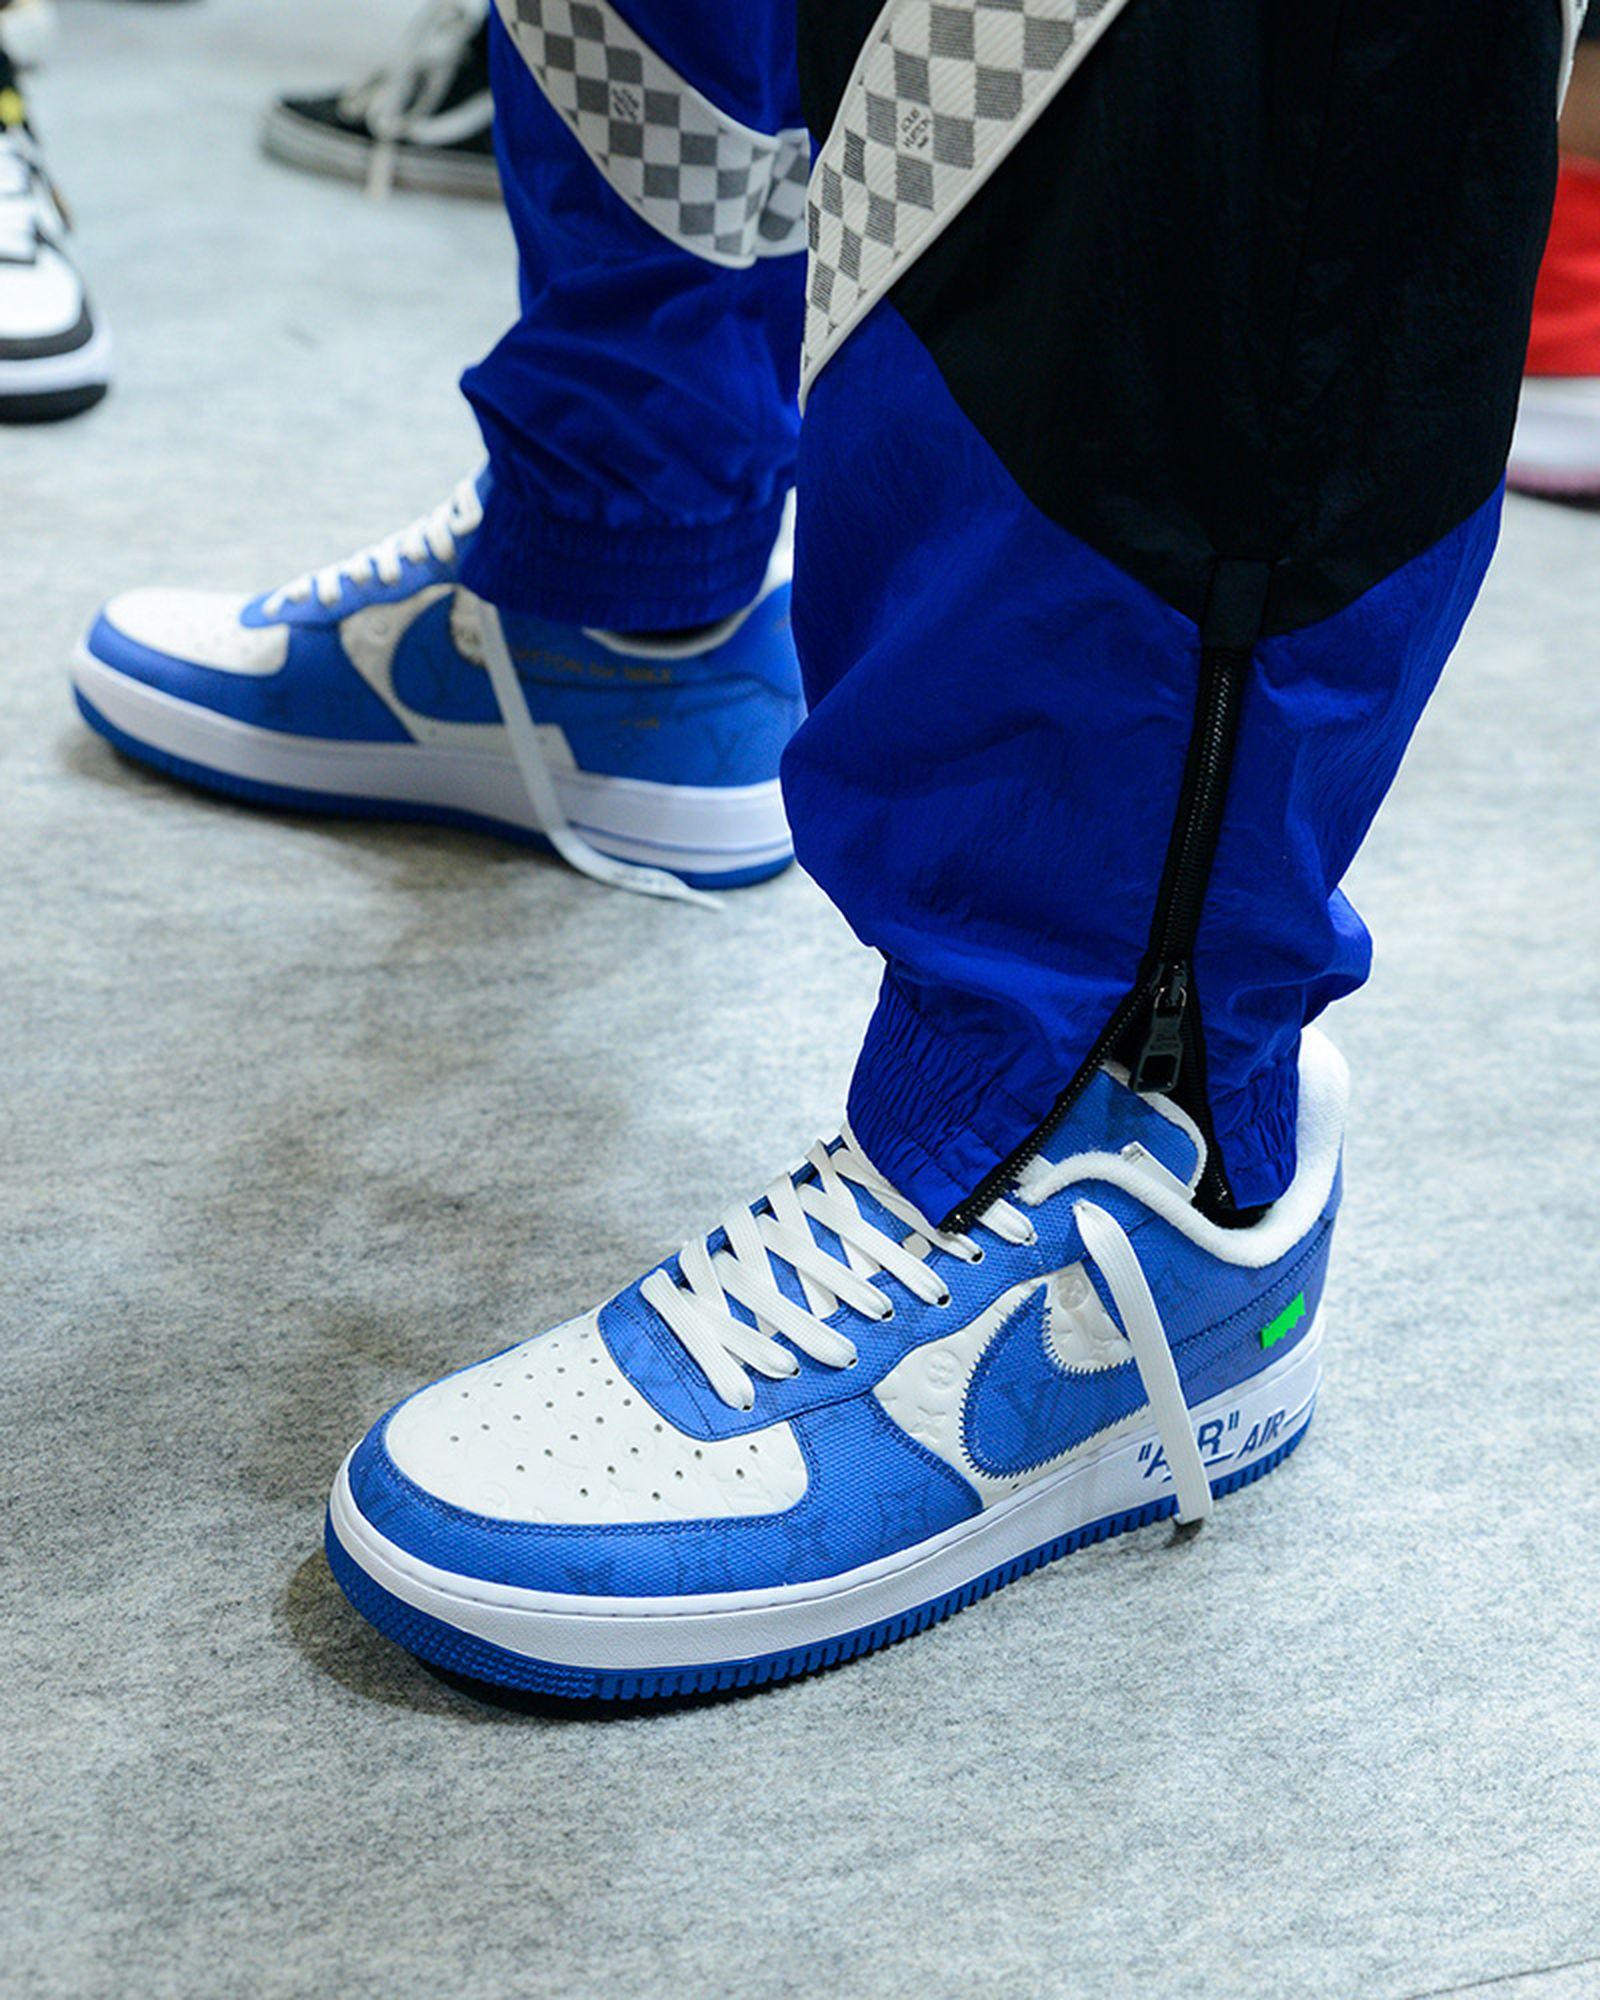 louis-vuitton-nike-virgil-abloh-sneaker-reveal-02